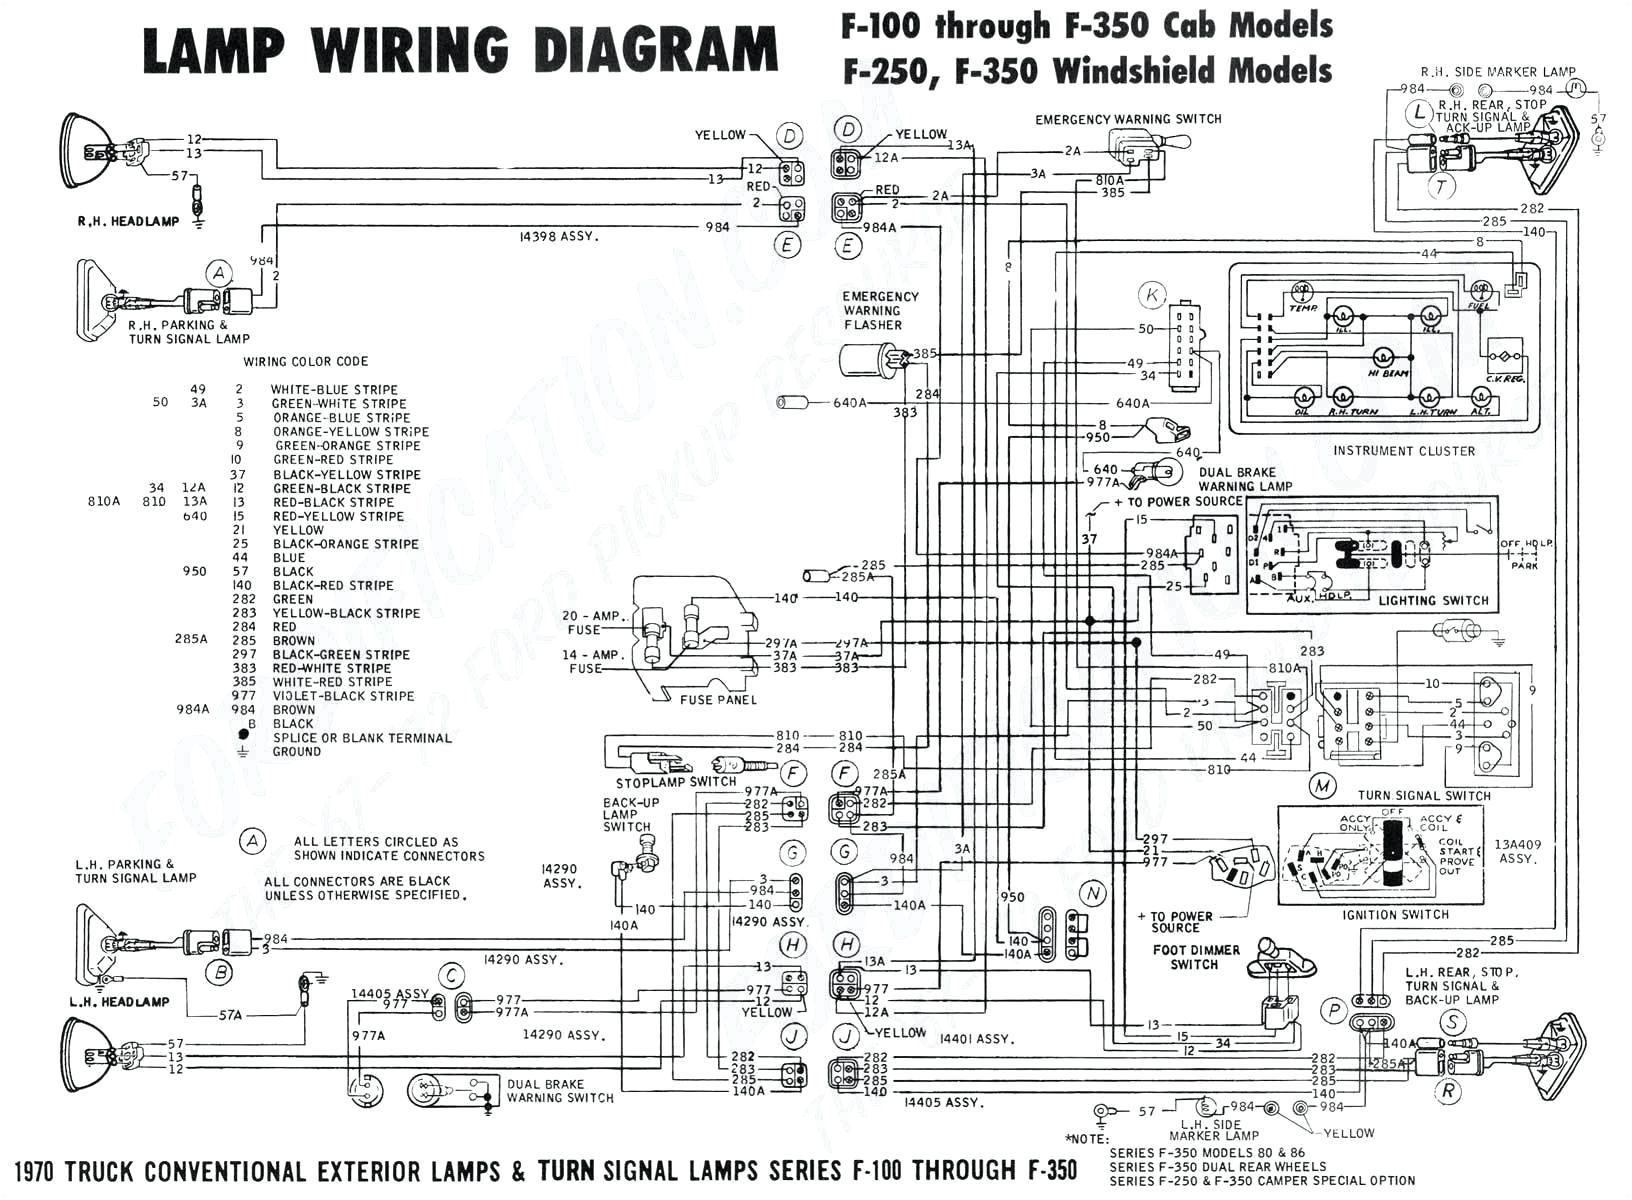 68 camaro horn relay wiring harness free download wiring diagram list 68 camaro alternator wiring diagram